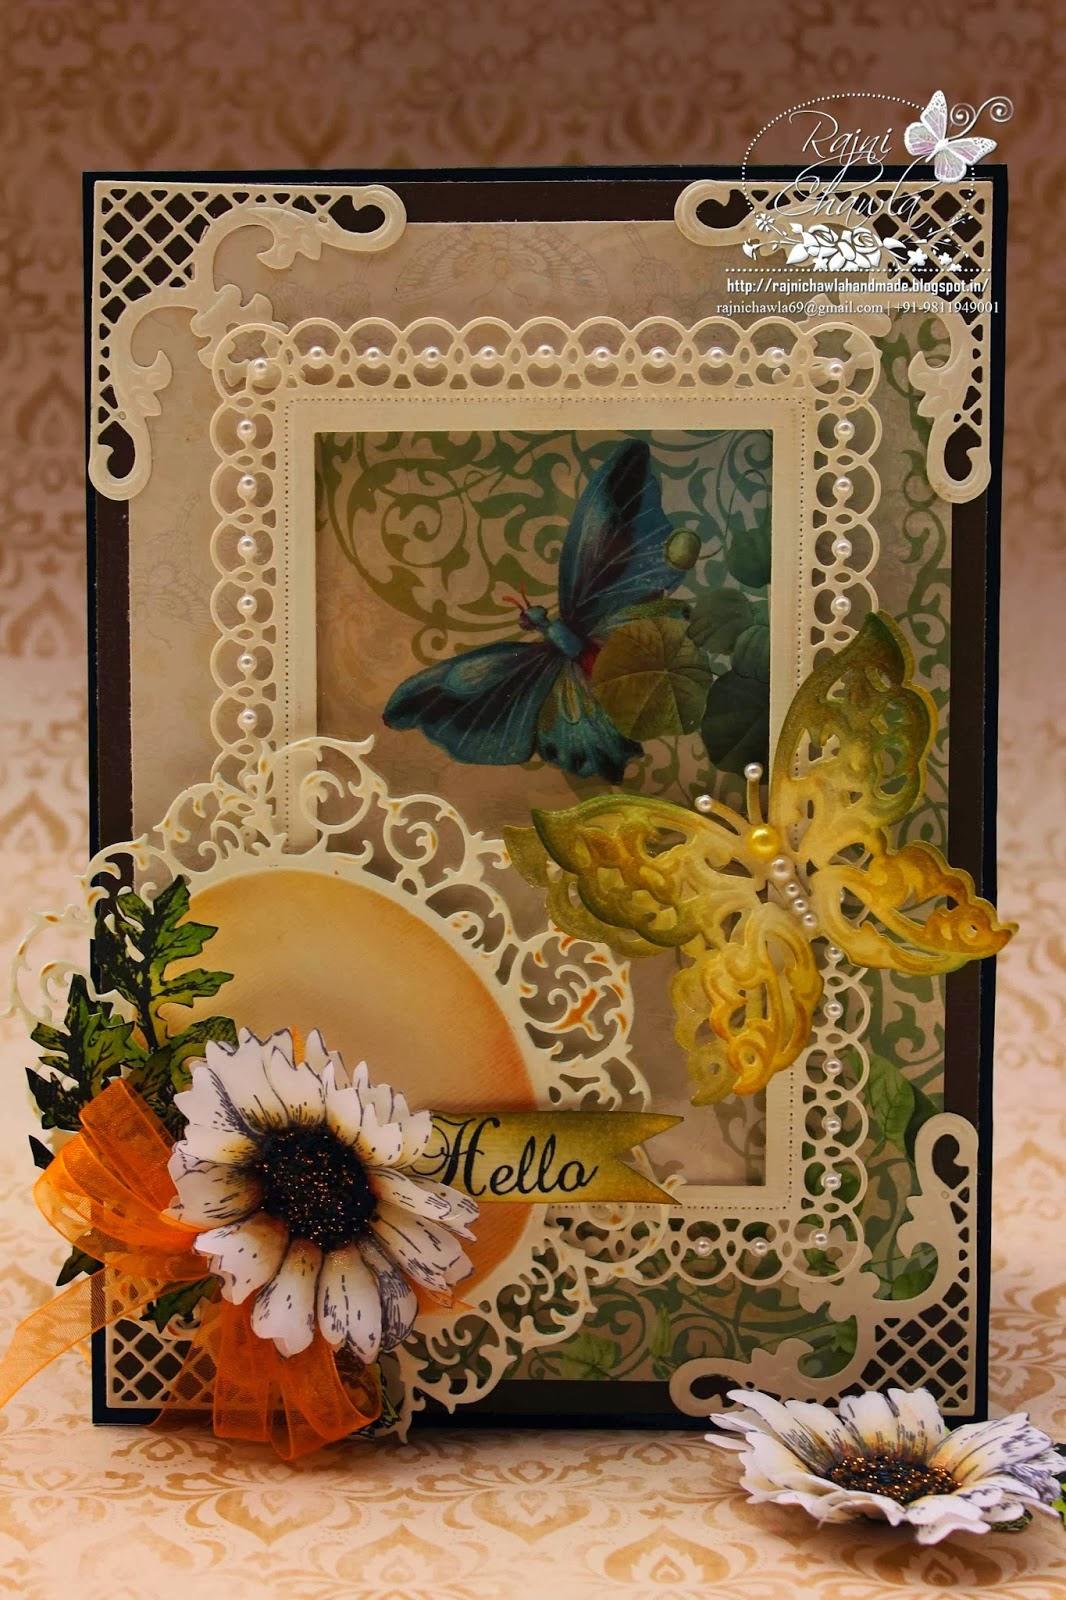 http://rajnichawlahandmade.blogspot.in/2014/02/botanical-bliss-justrite-challenge-114.html